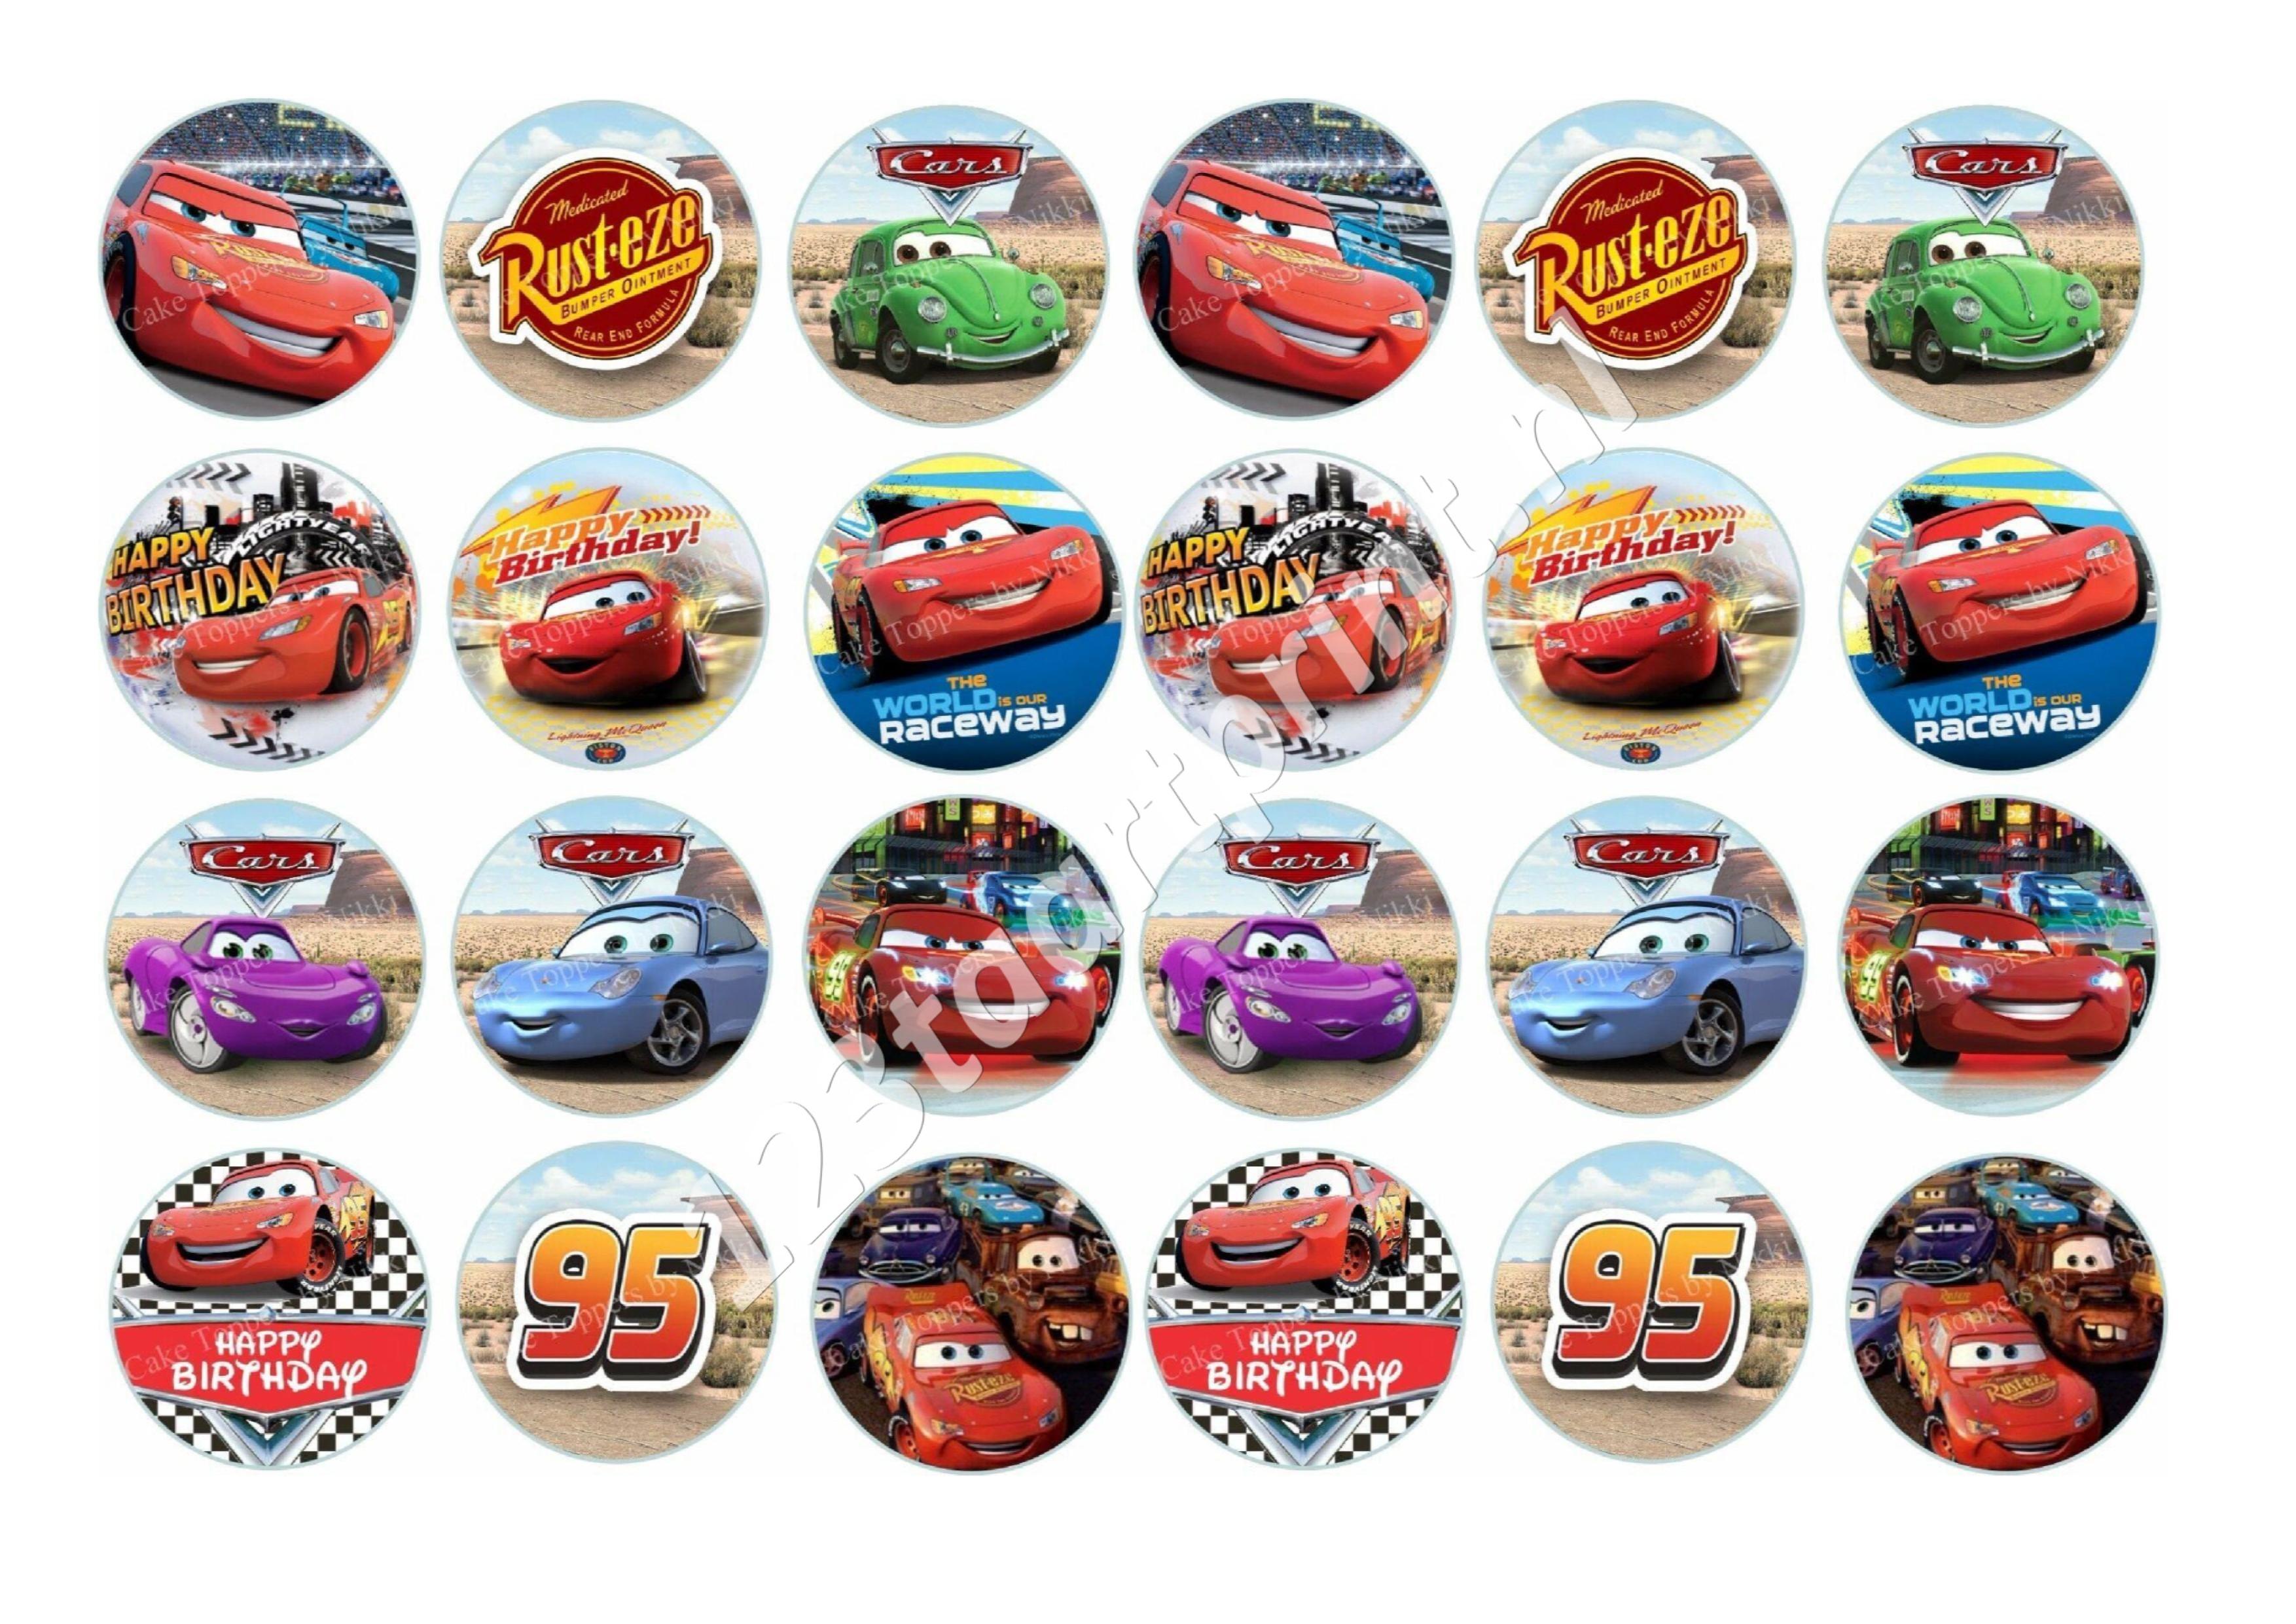 Cars 5 cupcakes